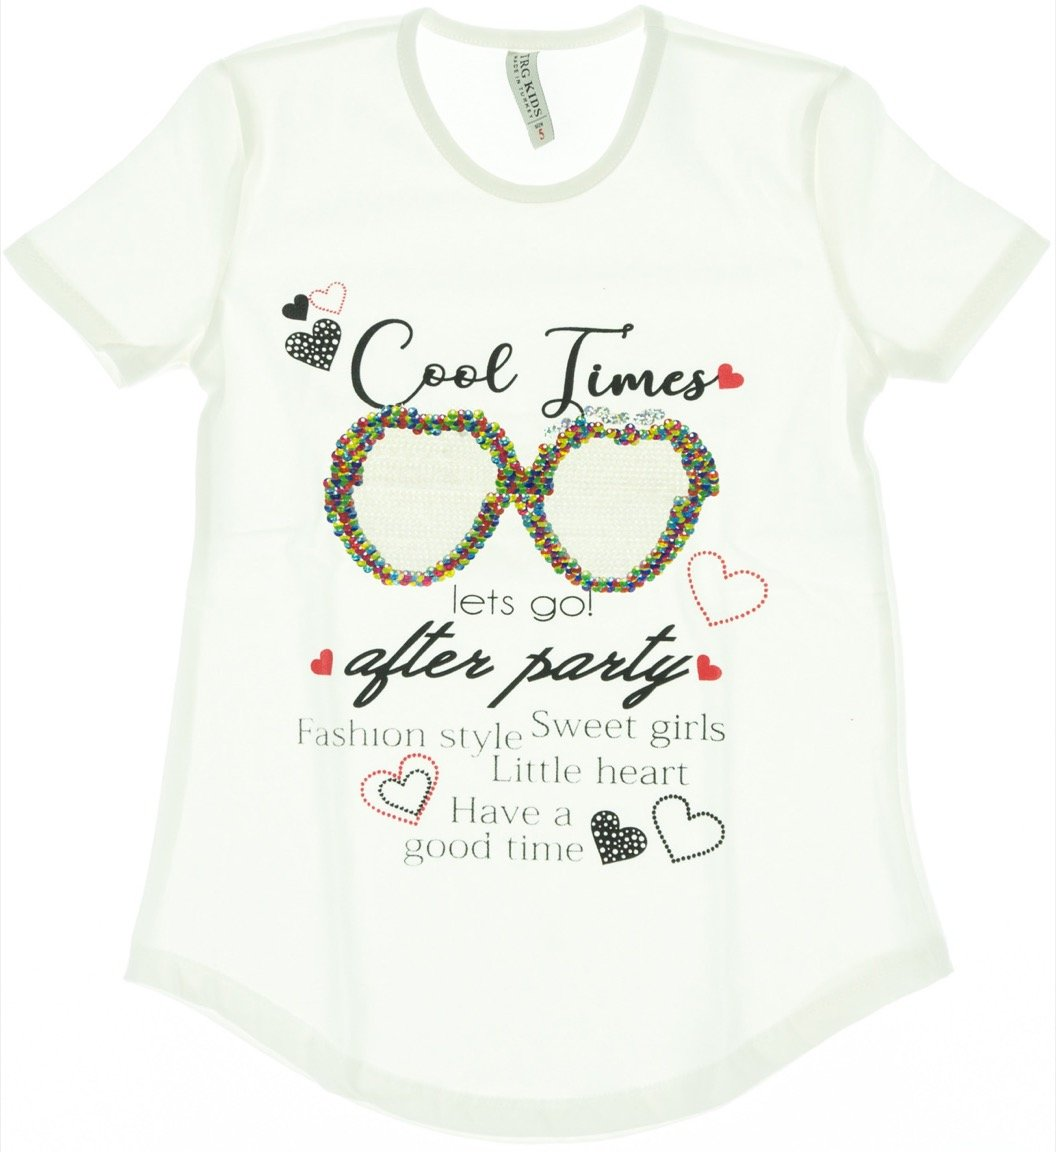 1a7c3bcd14e6 TRG παιδική μπλούζα «Ecru Cool Times» - b2b.AZshop.gr